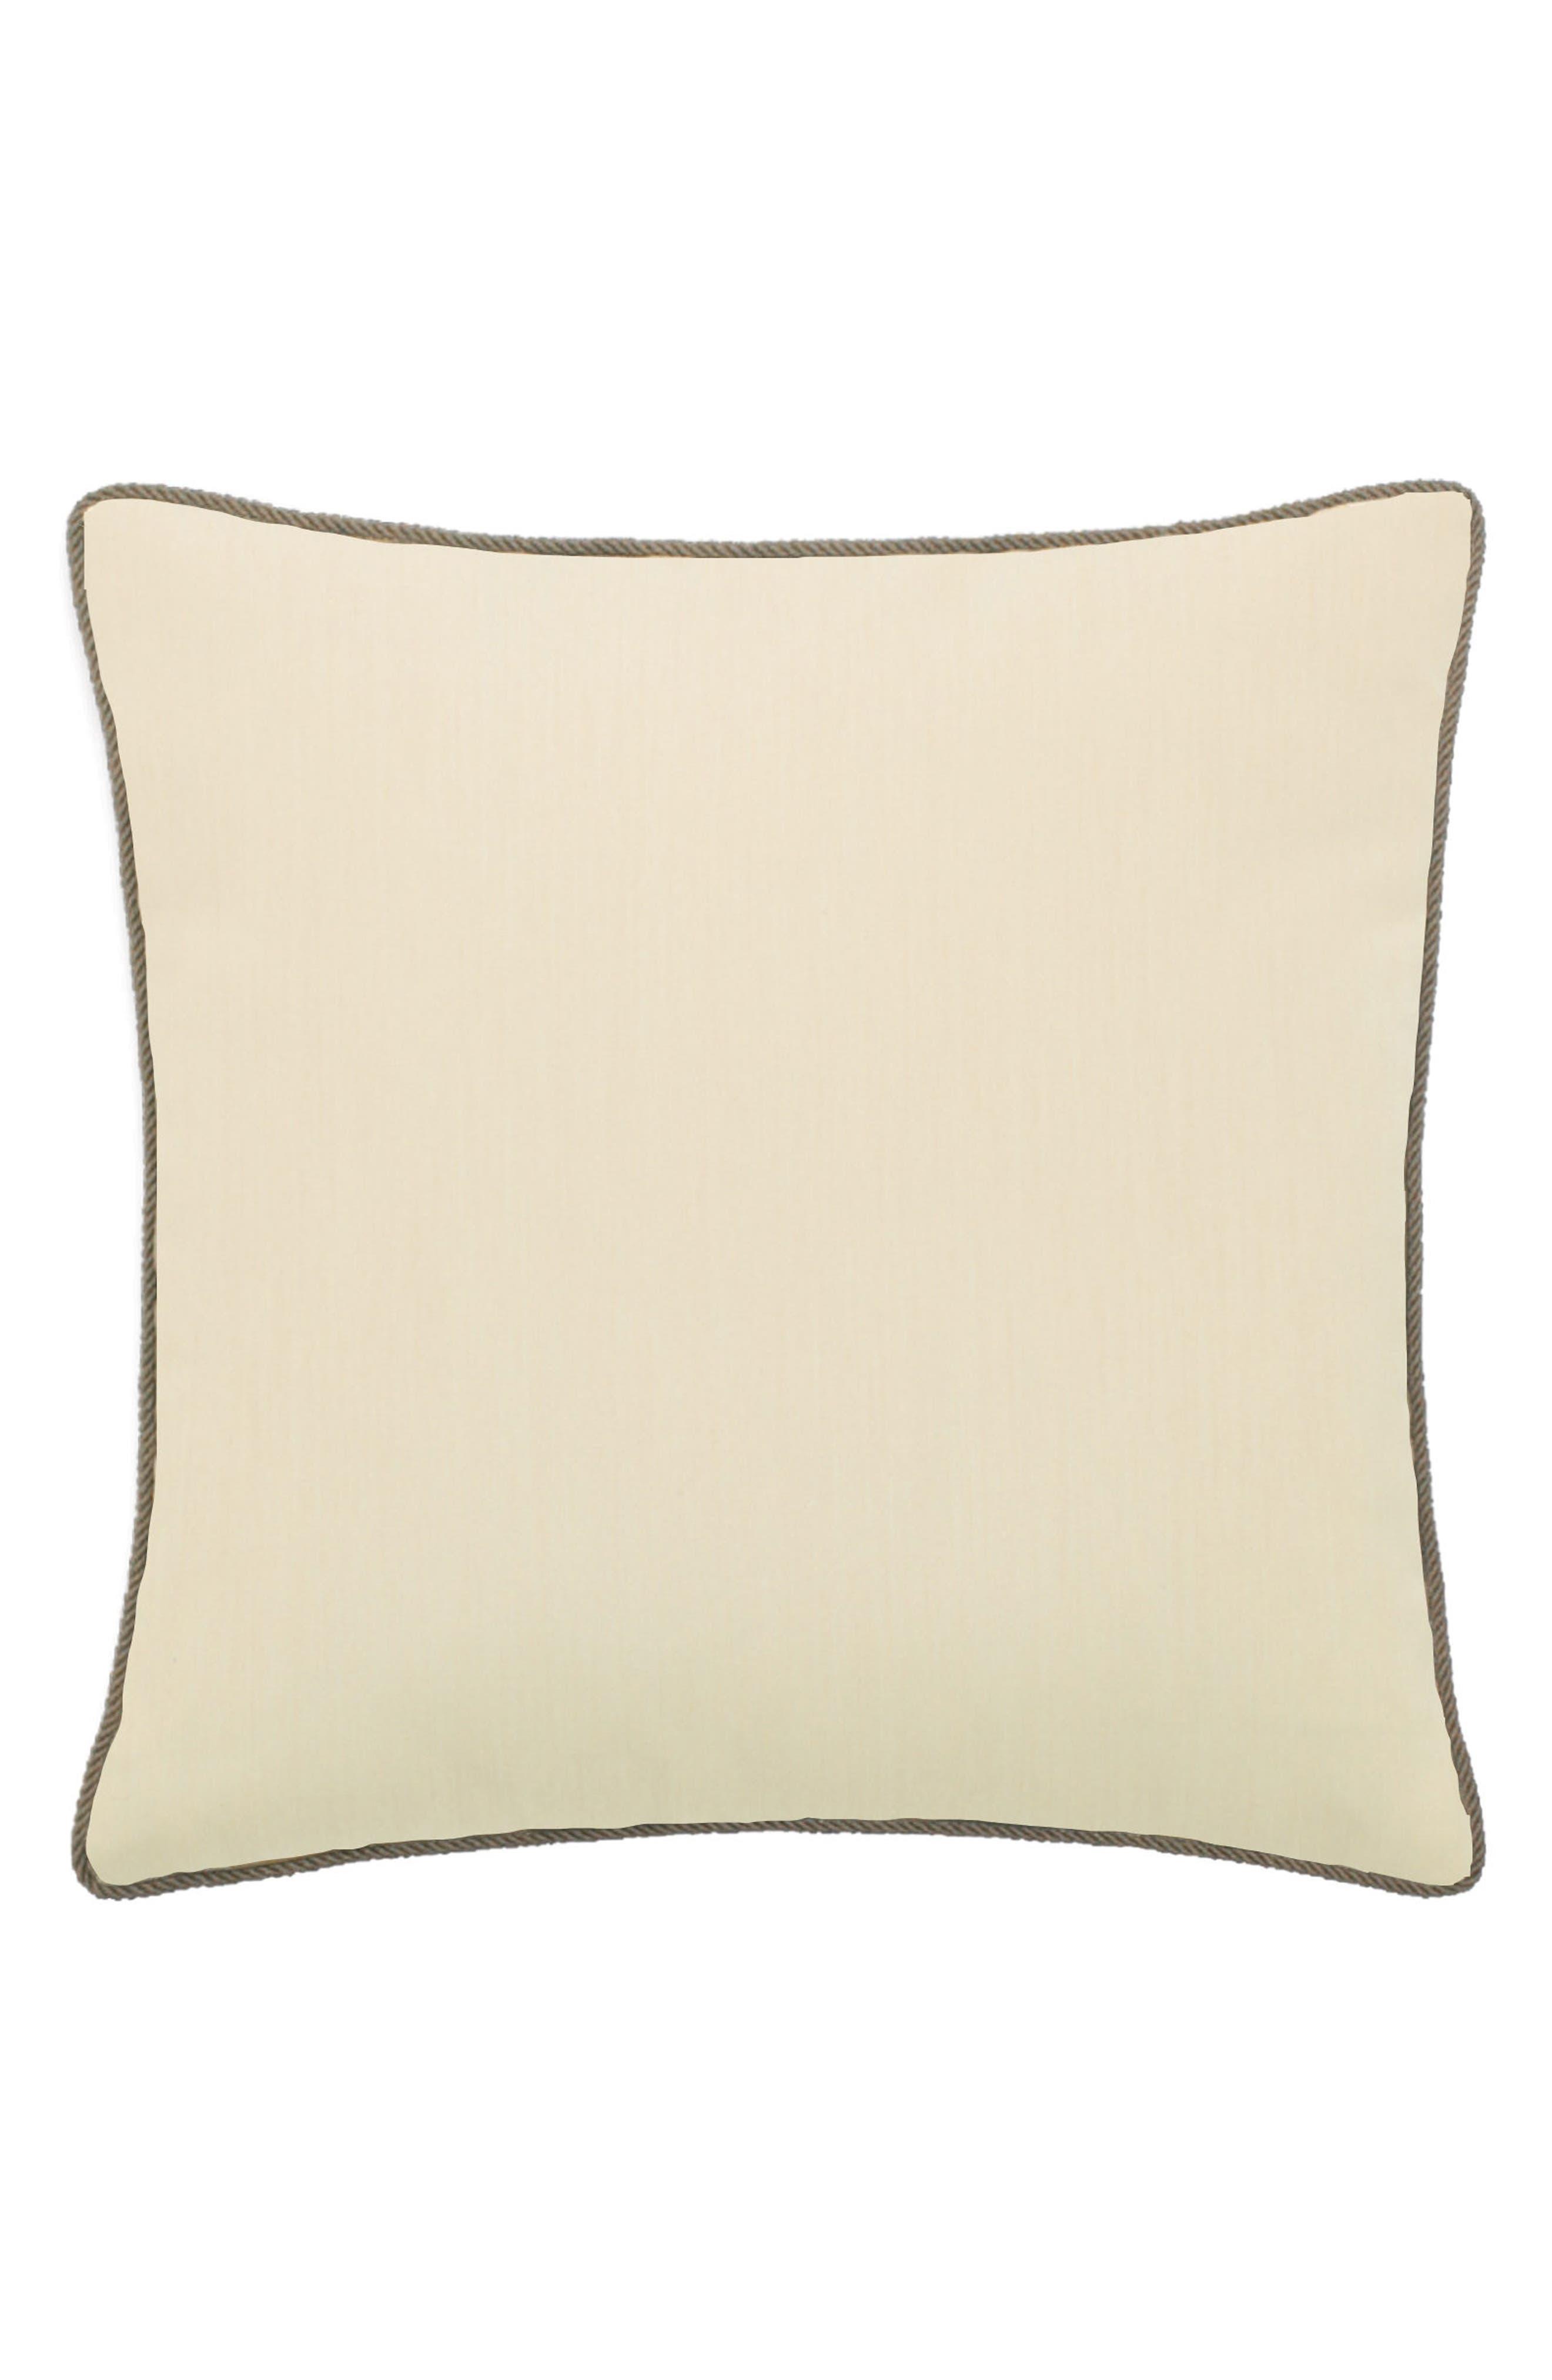 Jeweled Sedona Sun Indoor/Outdoor Accent Pillow,                             Alternate thumbnail 2, color,                             GOLD/ GREY